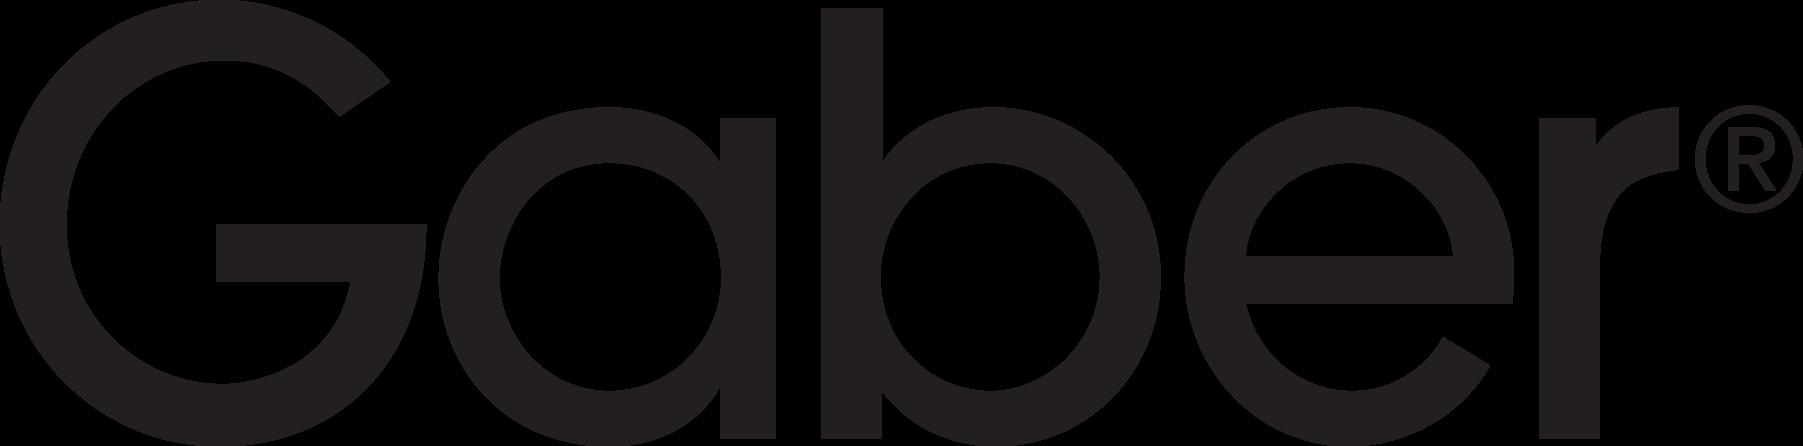 logo_gaber-contract-furniture_addessi-Design